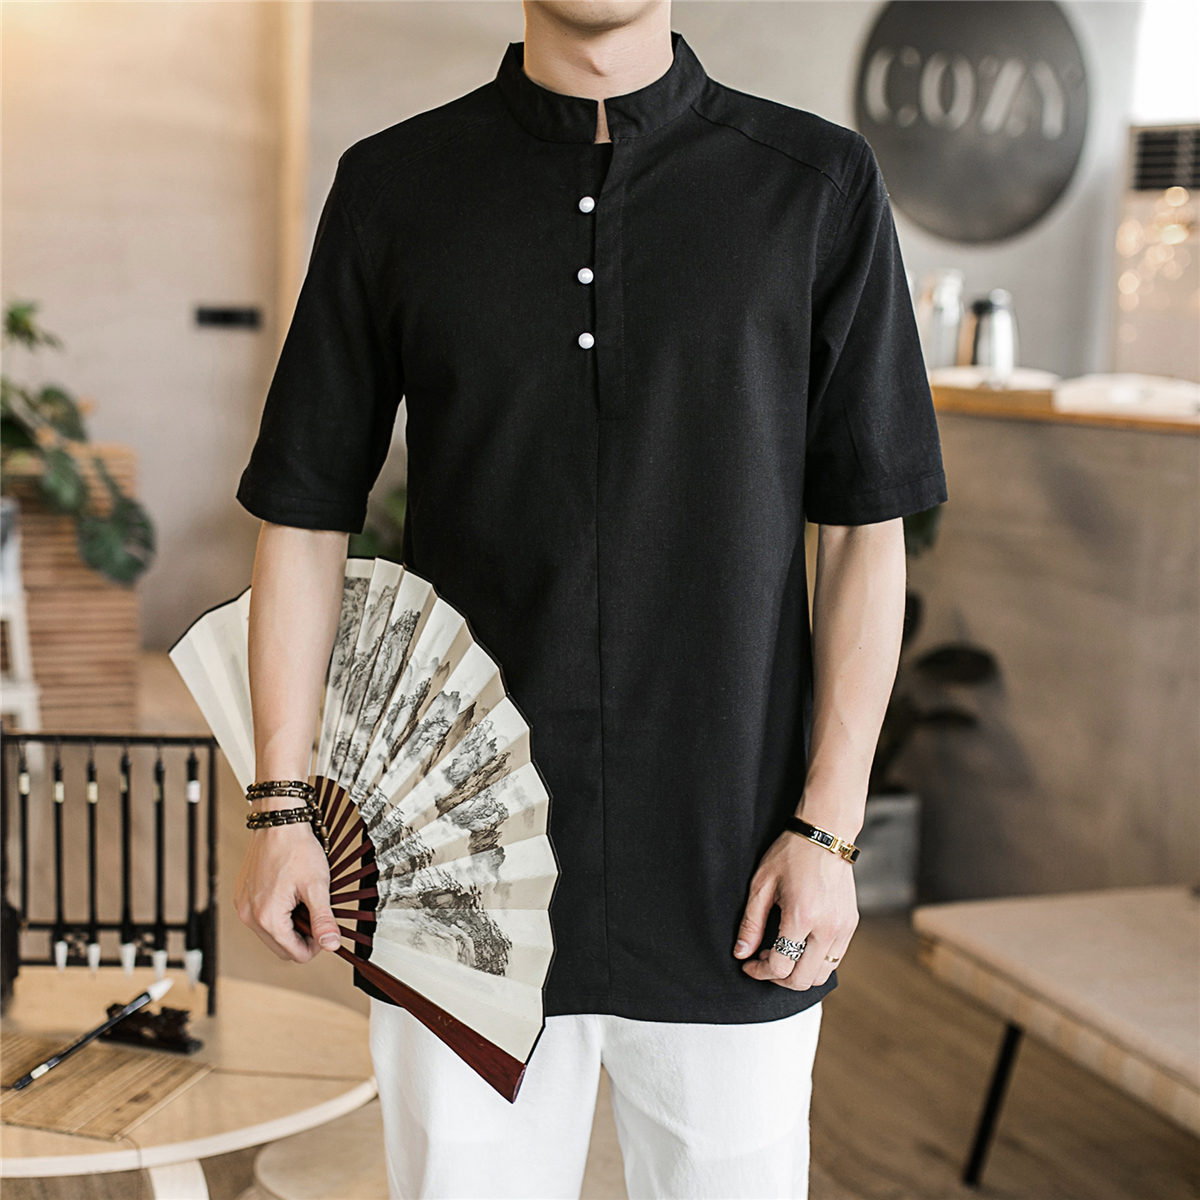 Men Solid Harajuku Summer Shirts 2020 Streetwear Linen Shirt Mens Fashions Male Chinese Style Vintage White Blouse Men Clothing